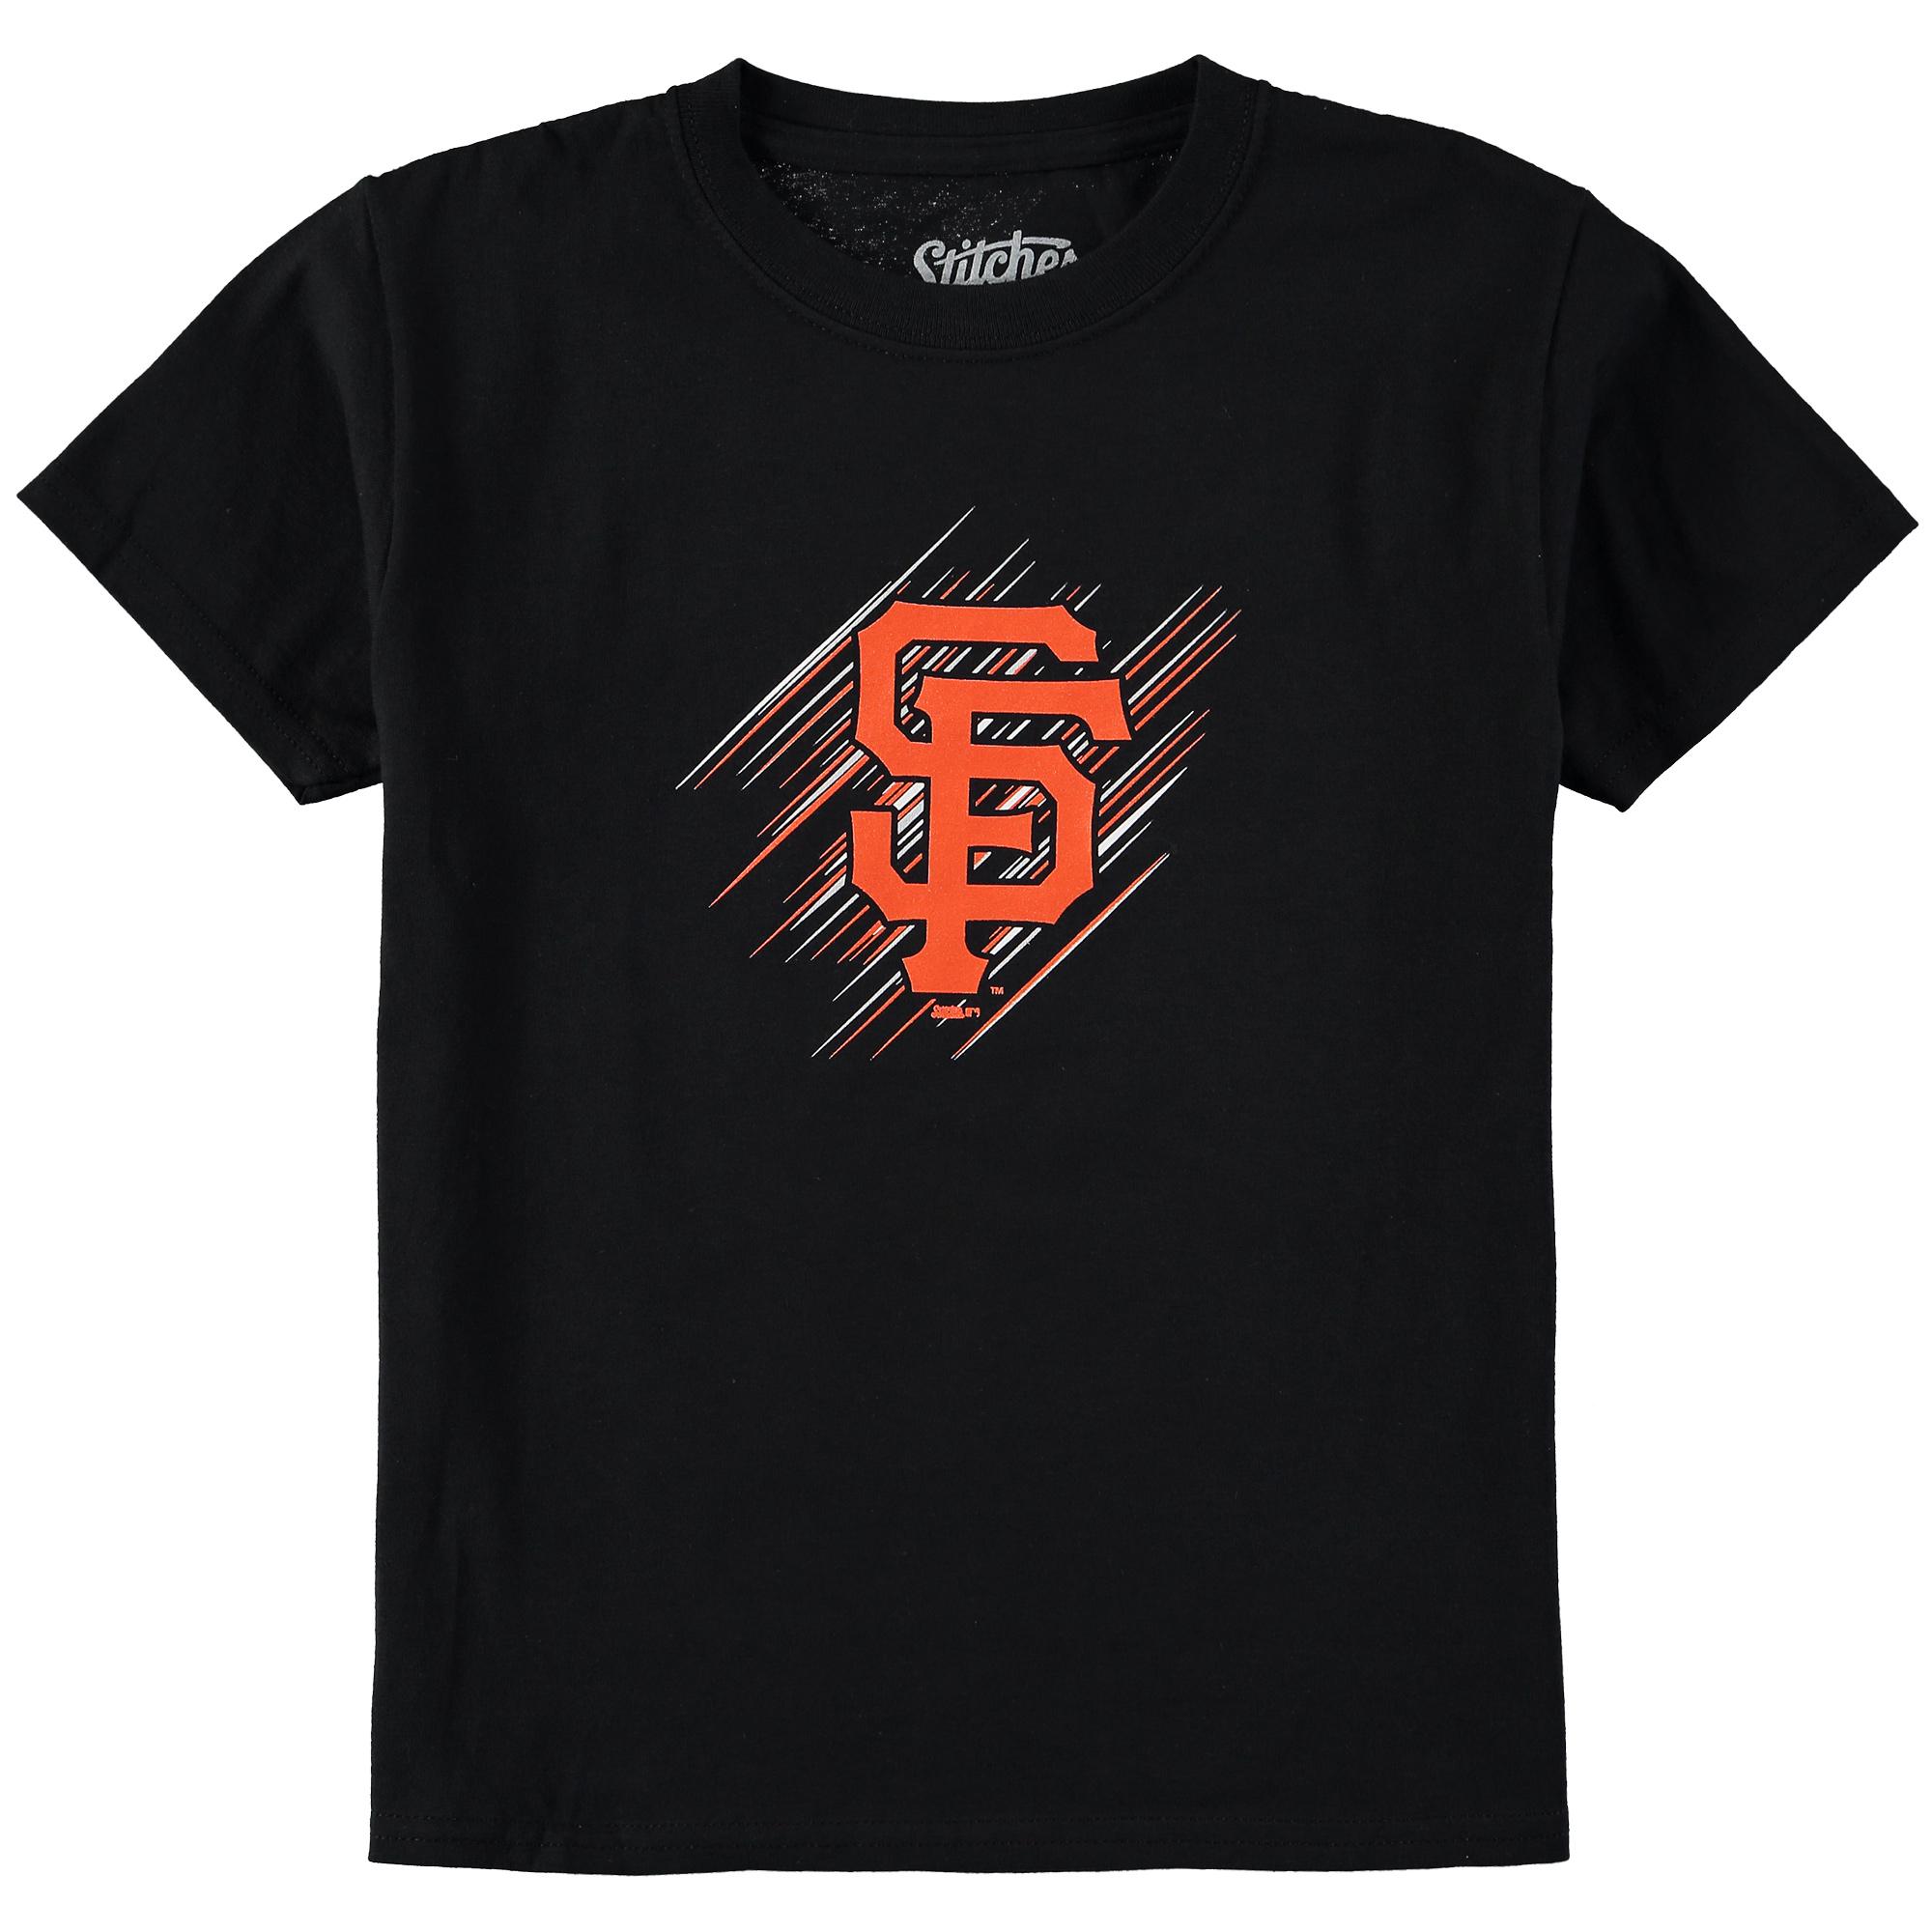 San Francisco Giants Stitches Youth Team Logo T-Shirt - Black